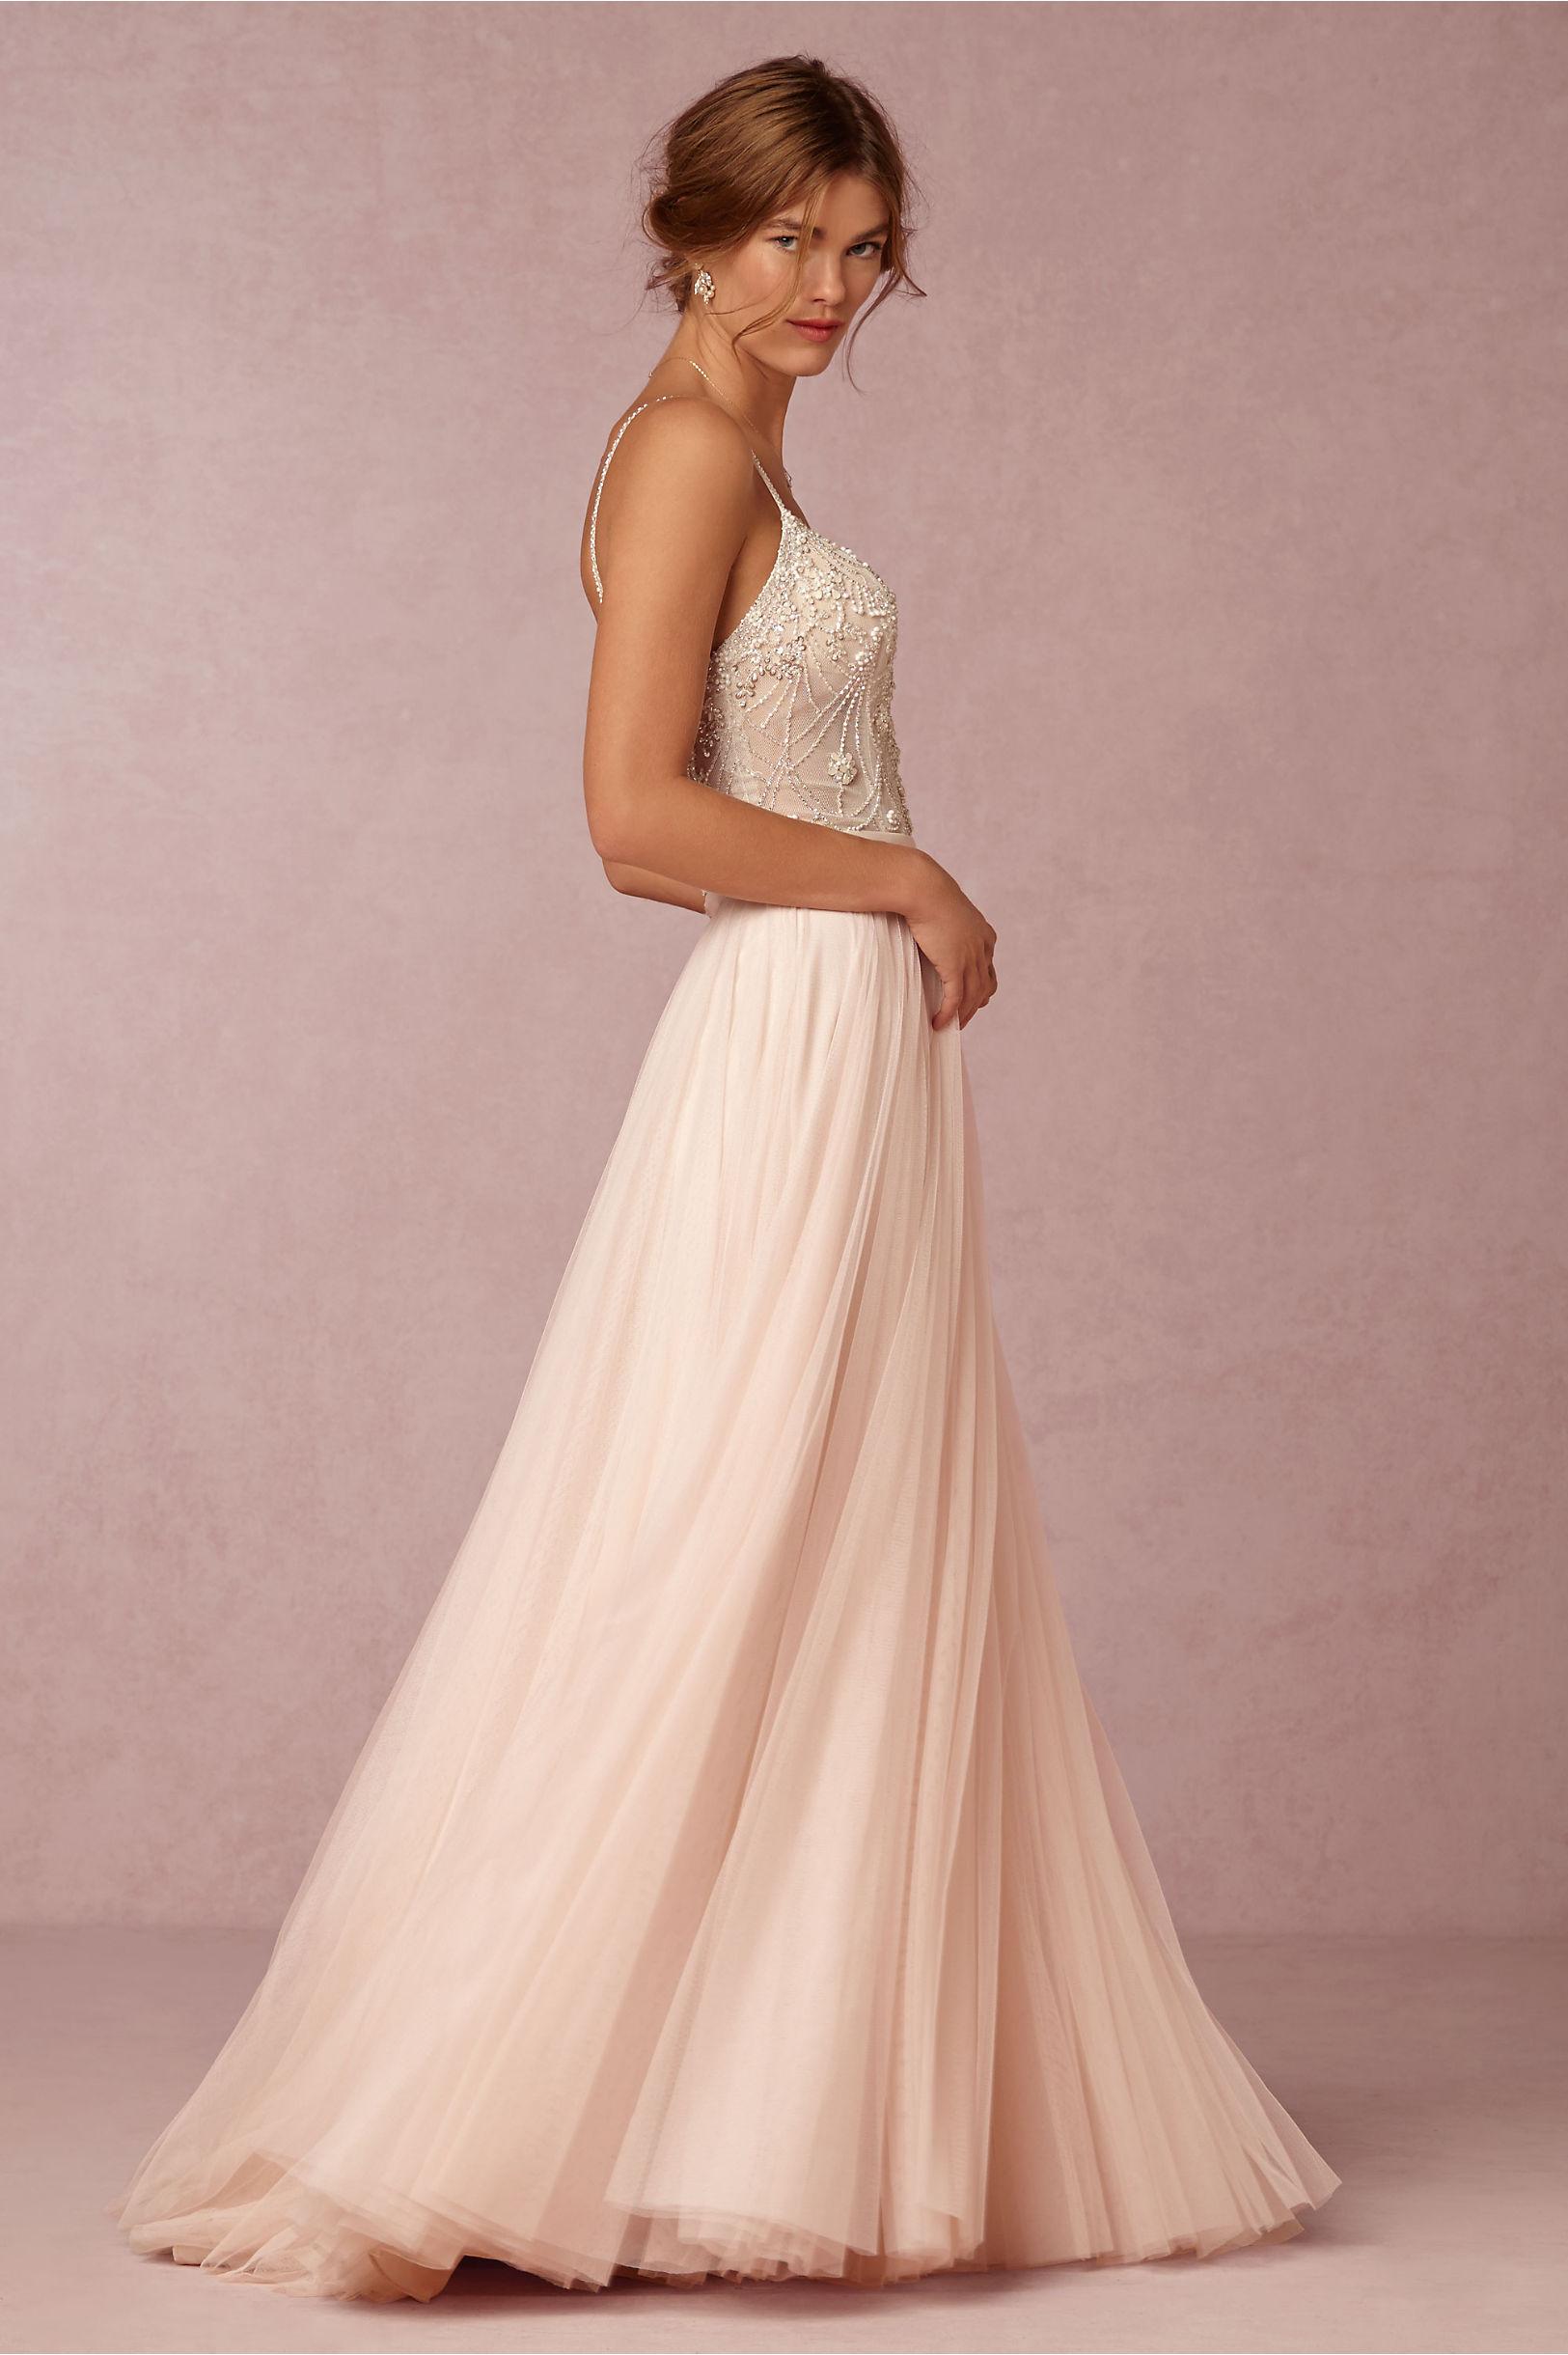 Ella Bodysuit & Amora Skirt in Bride | BHLDN